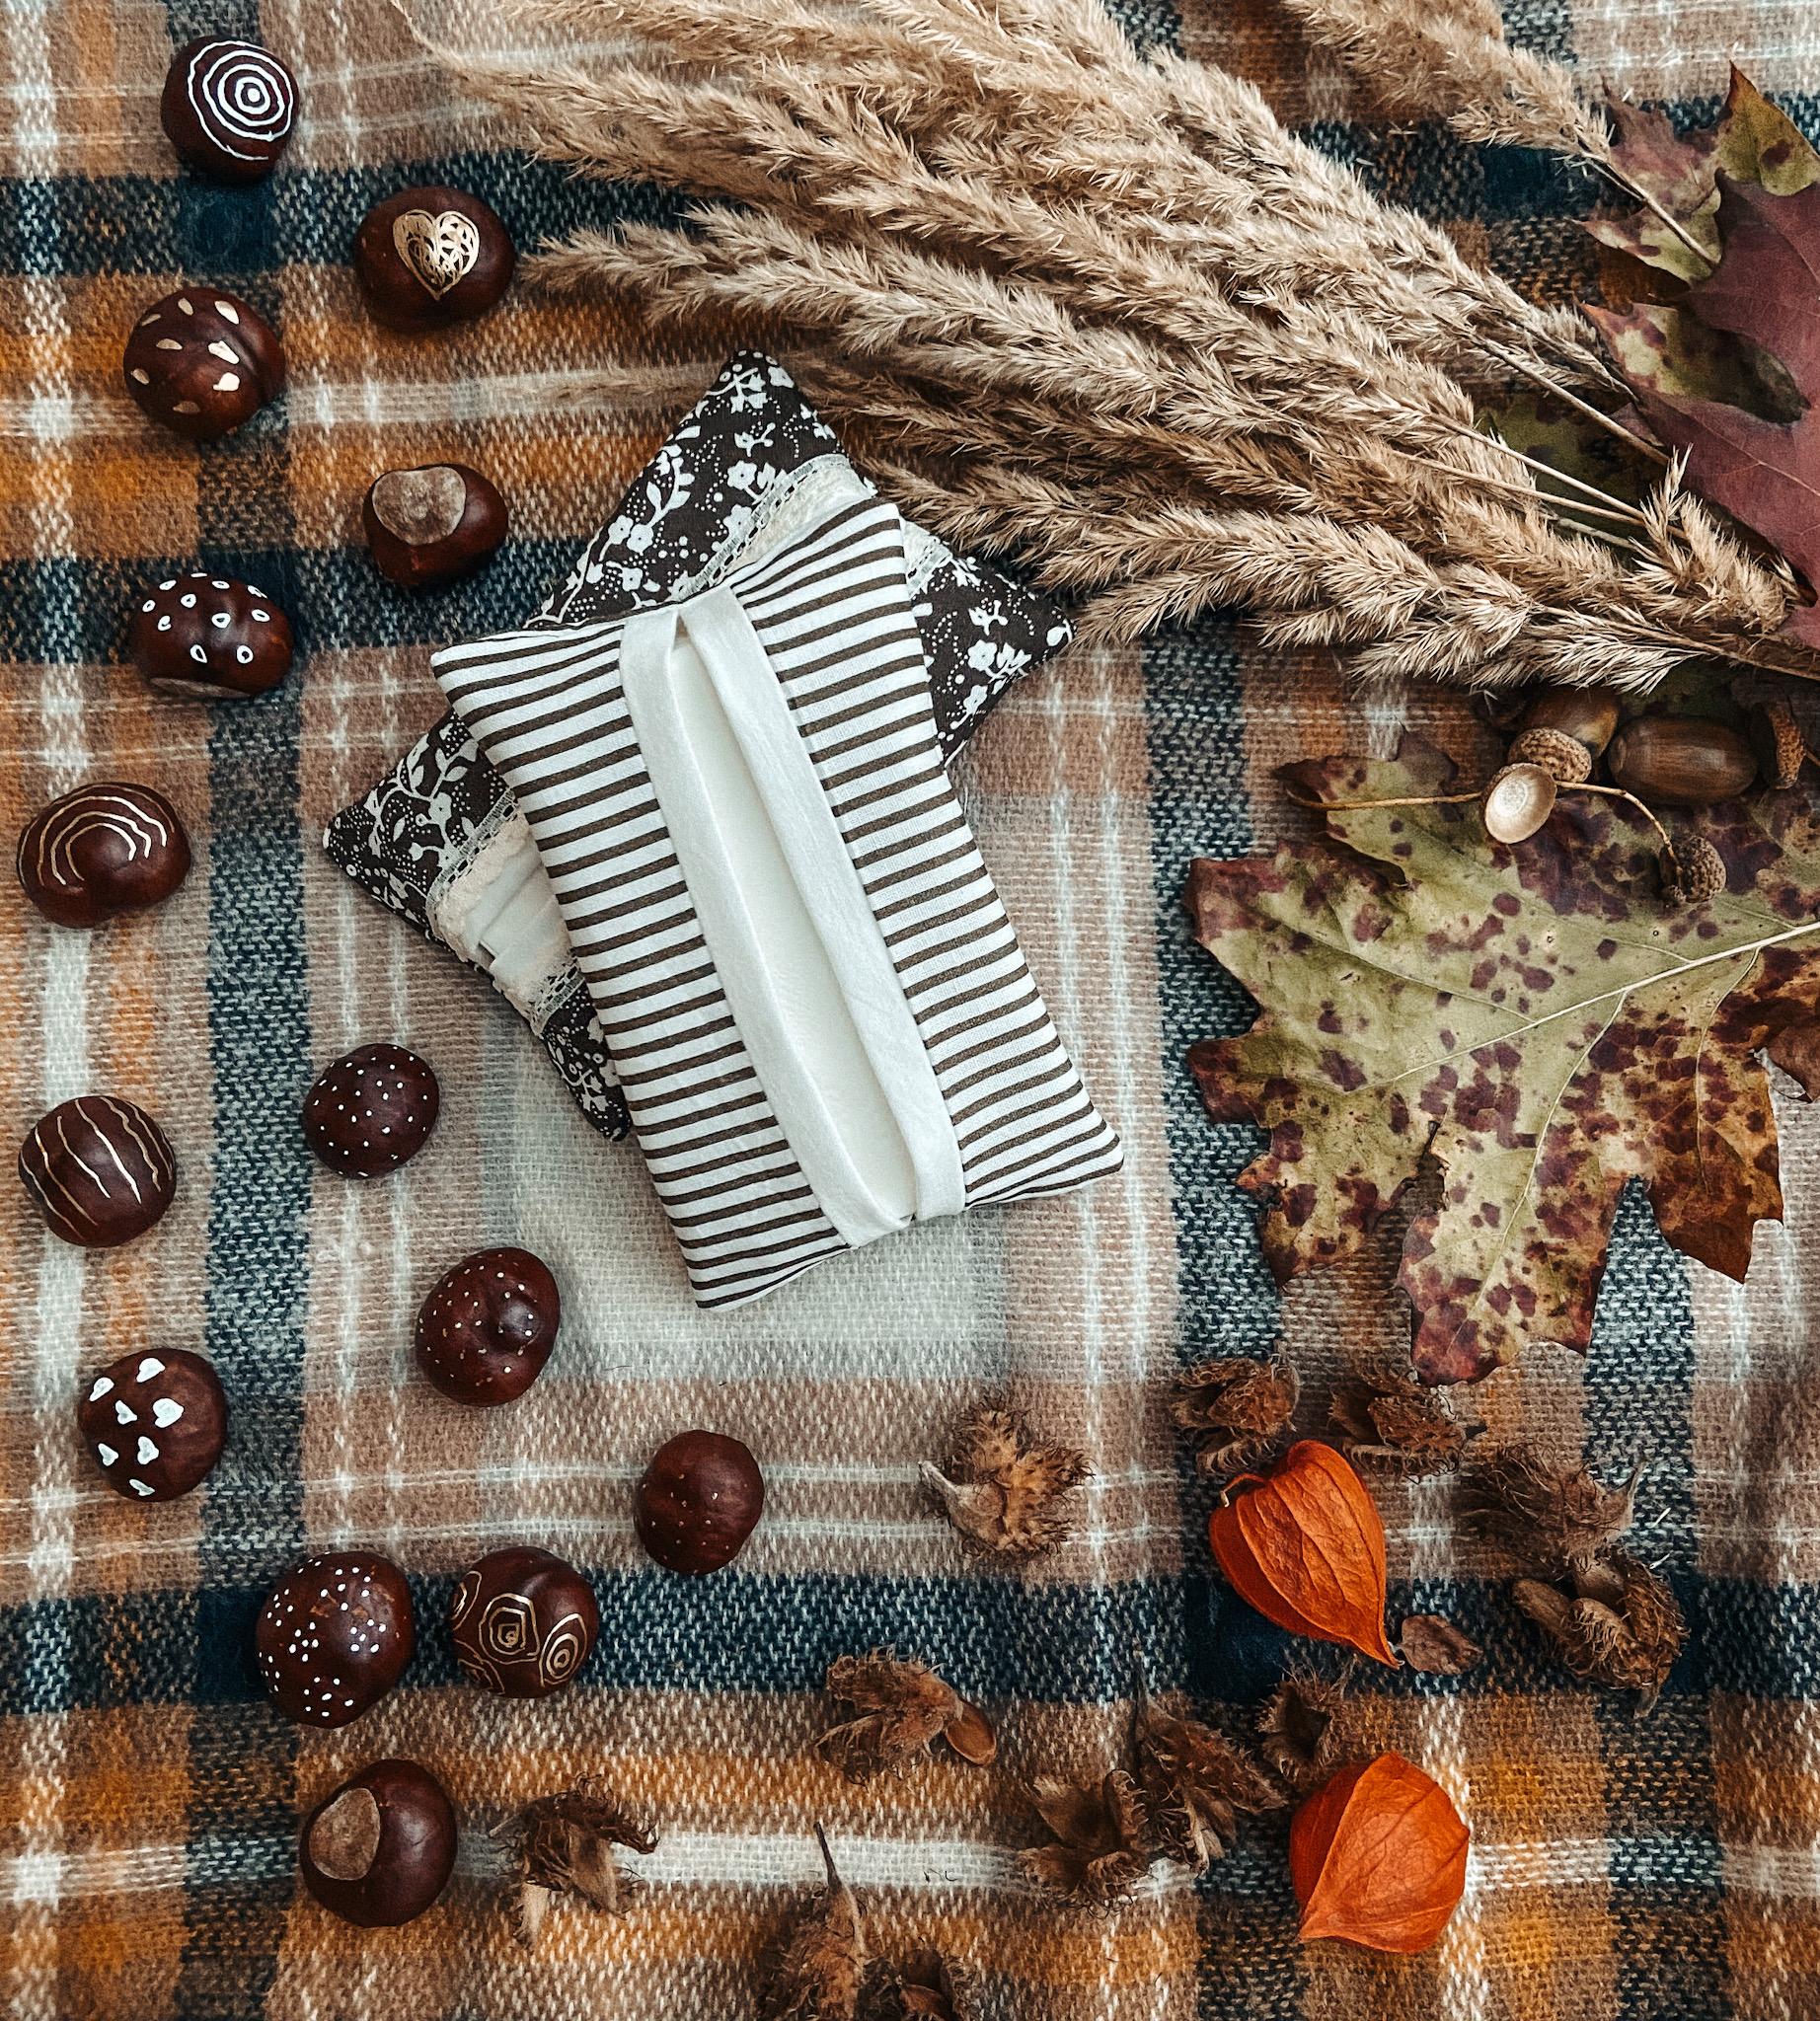 #handmade #herbst #fall #autumn #sewn